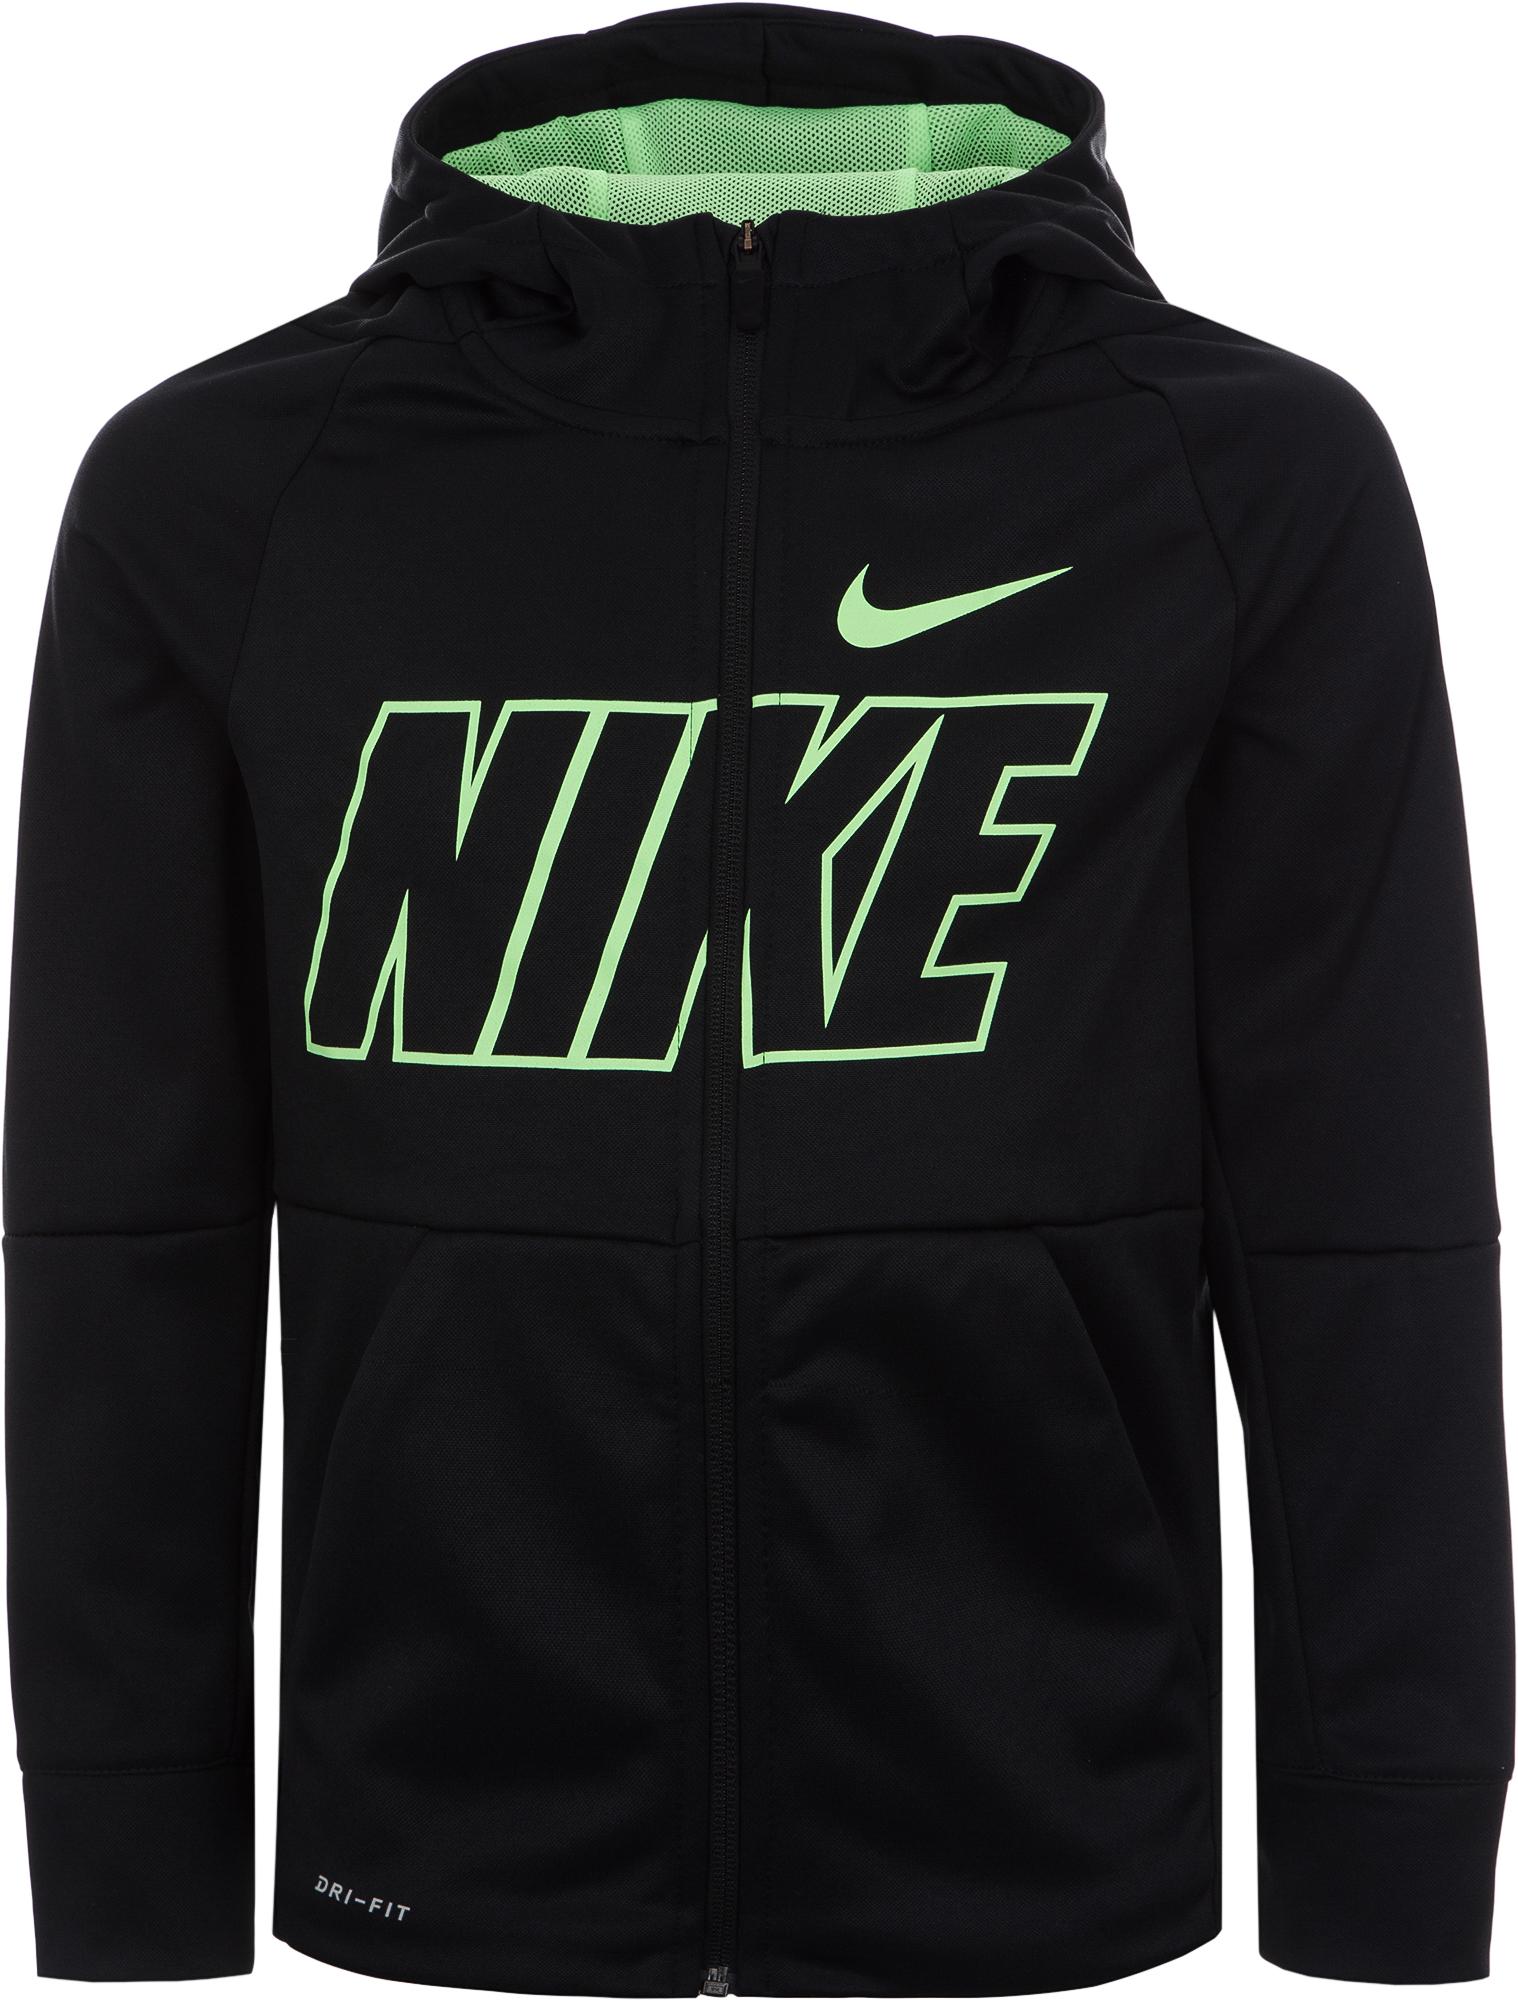 Nike Джемпер для мальчиков Nike Therma, размер 158-170